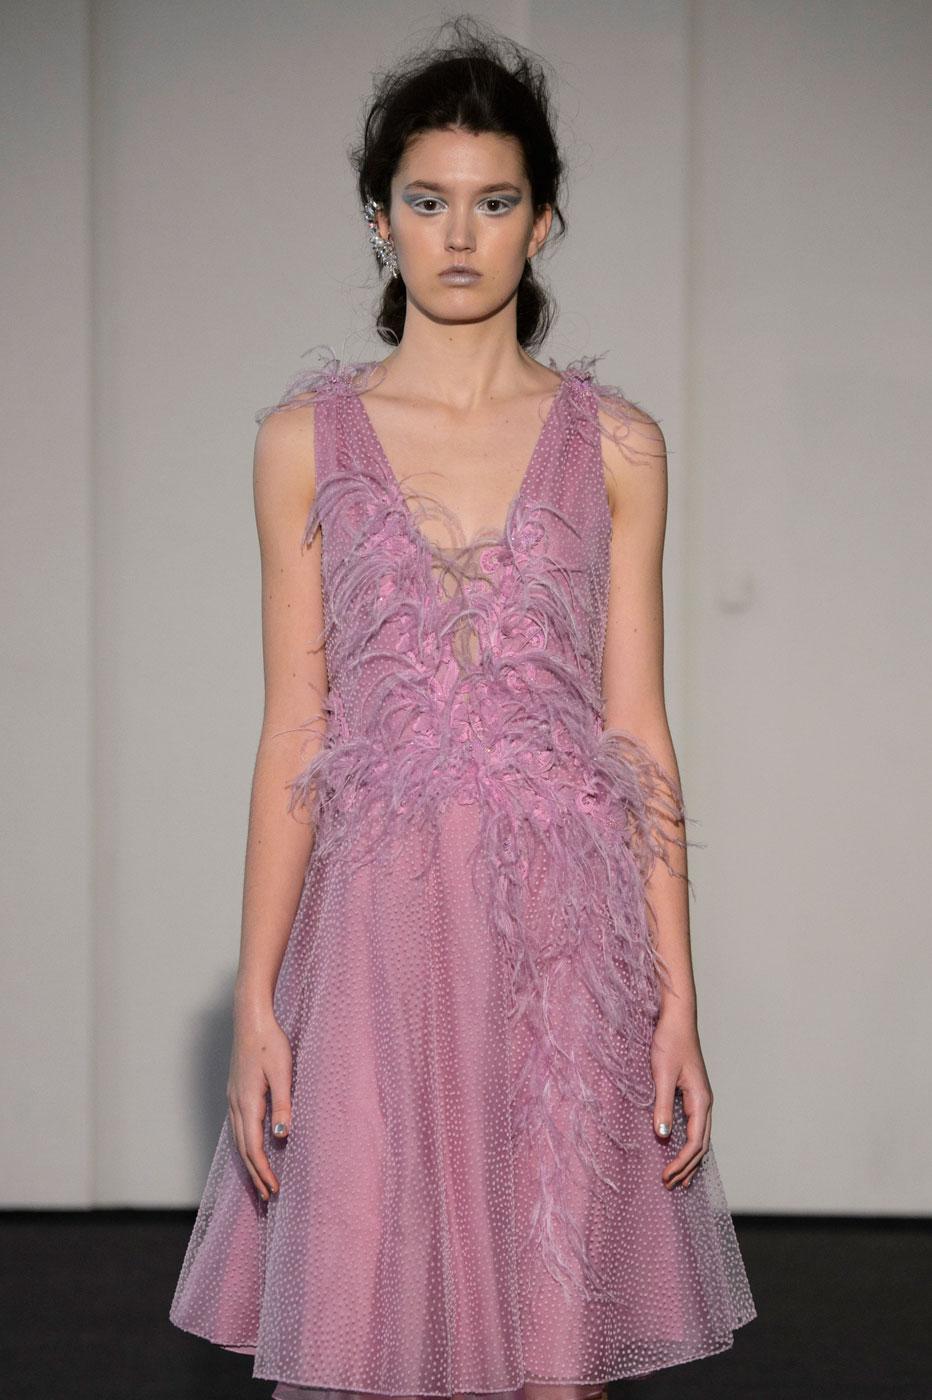 Busardi-fashion-runway-show-haute-couture-paris-spring-2015-the-impression-35